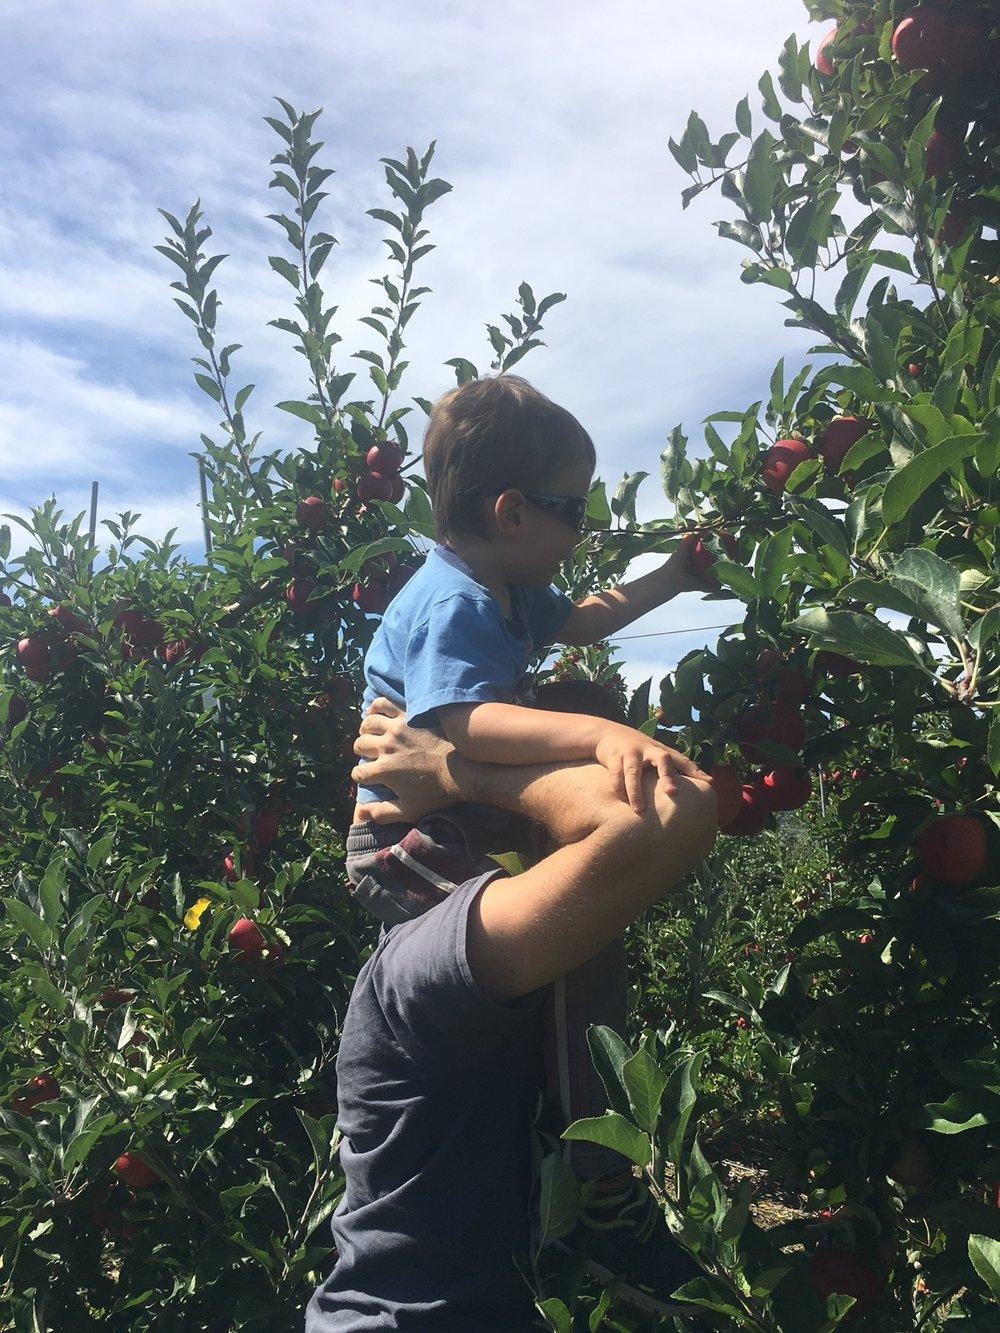 apple_picking_fall_autumn_family